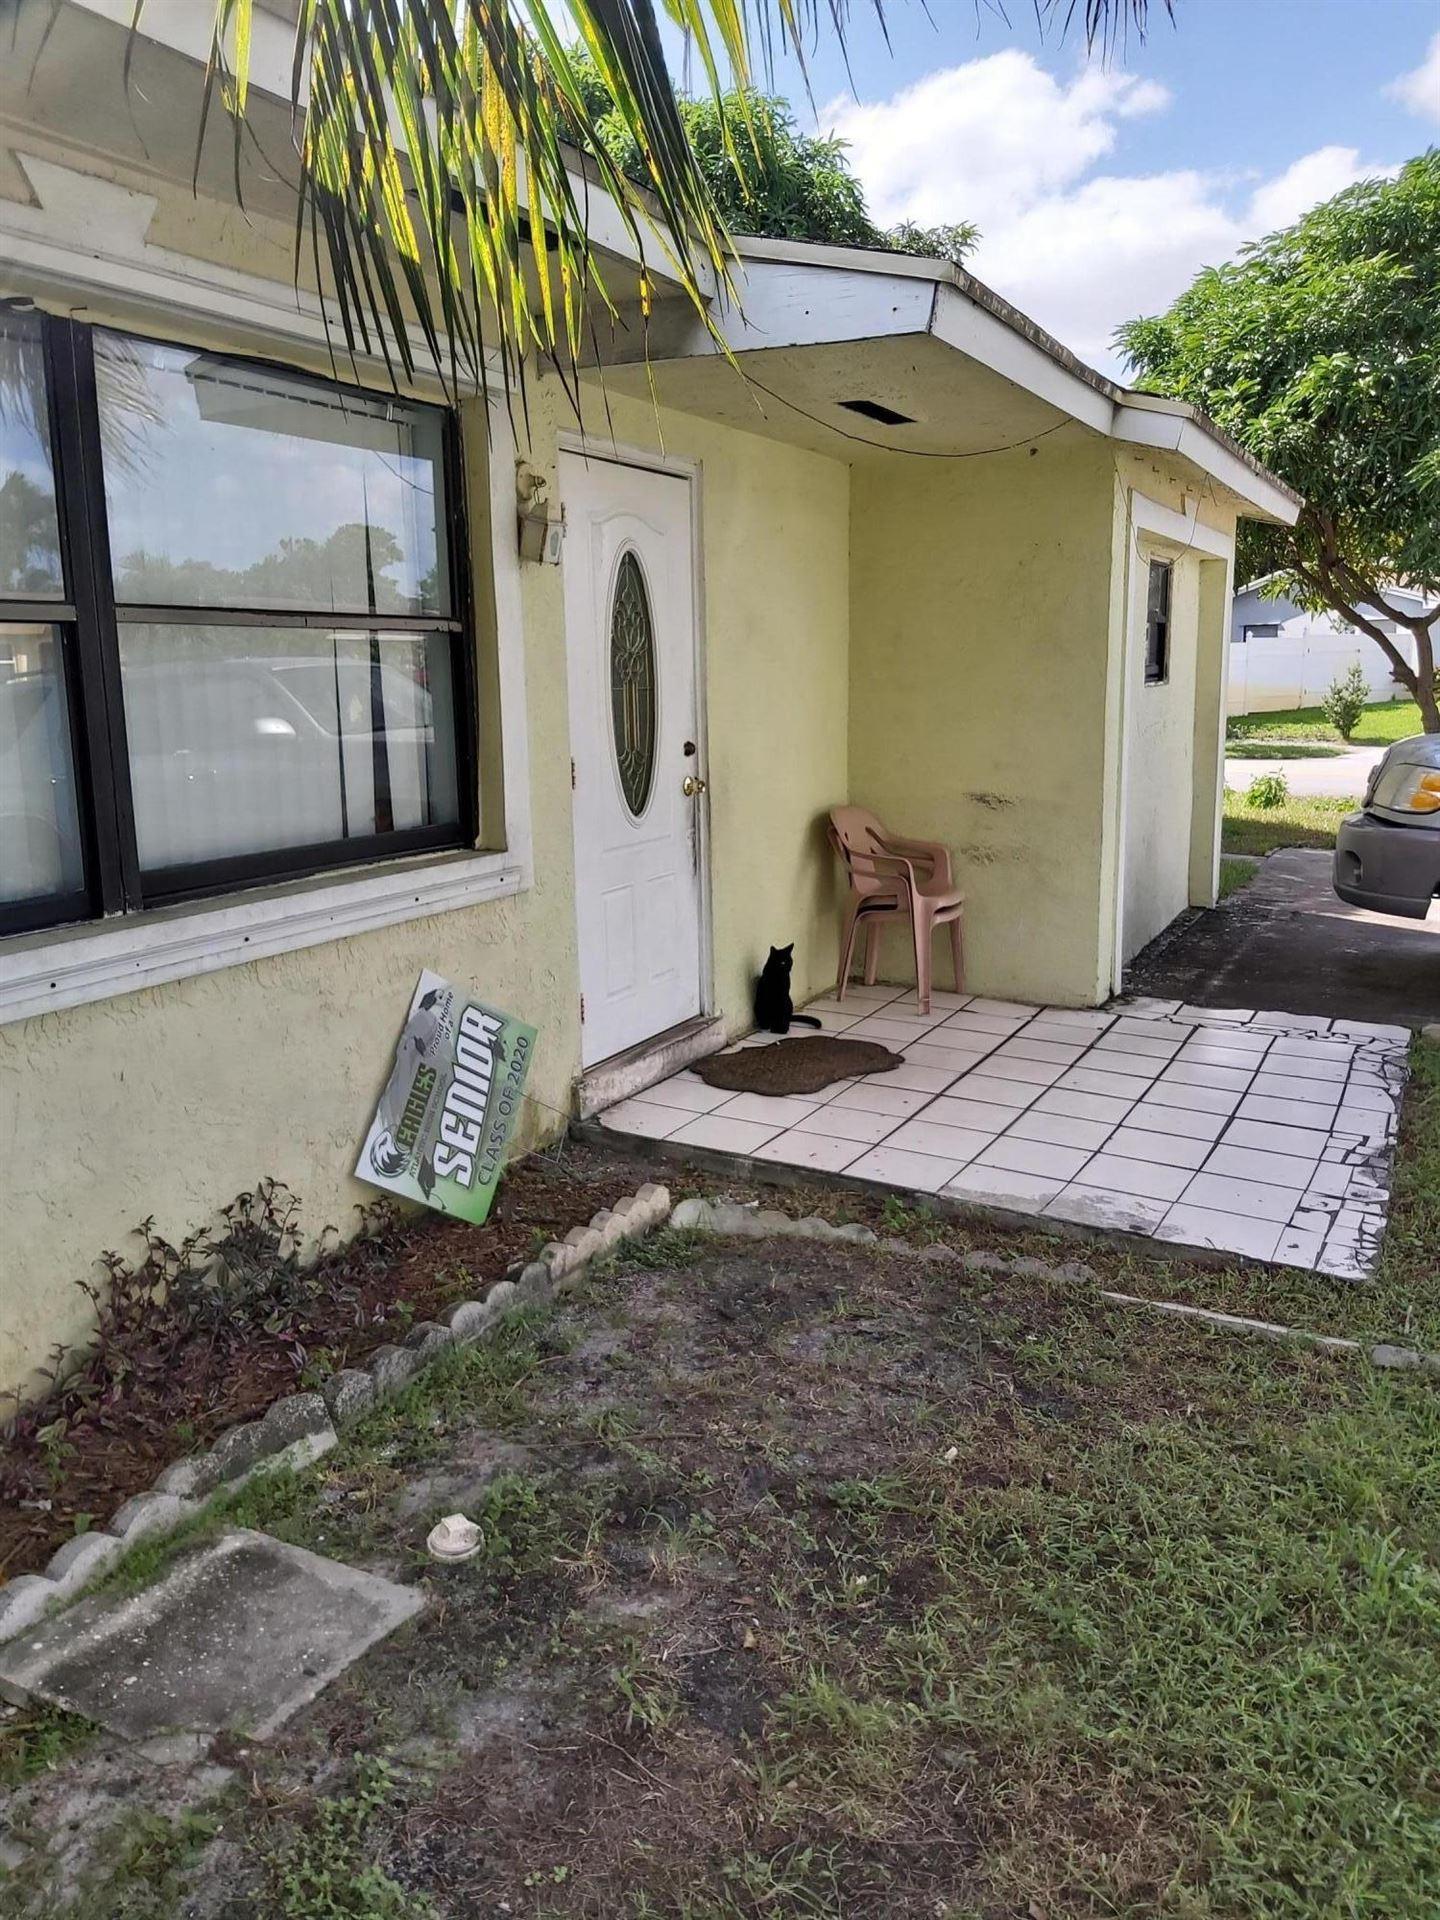 2020 SW 13th Street Street, Delray Beach, FL 33445 - MLS#: RX-10670177